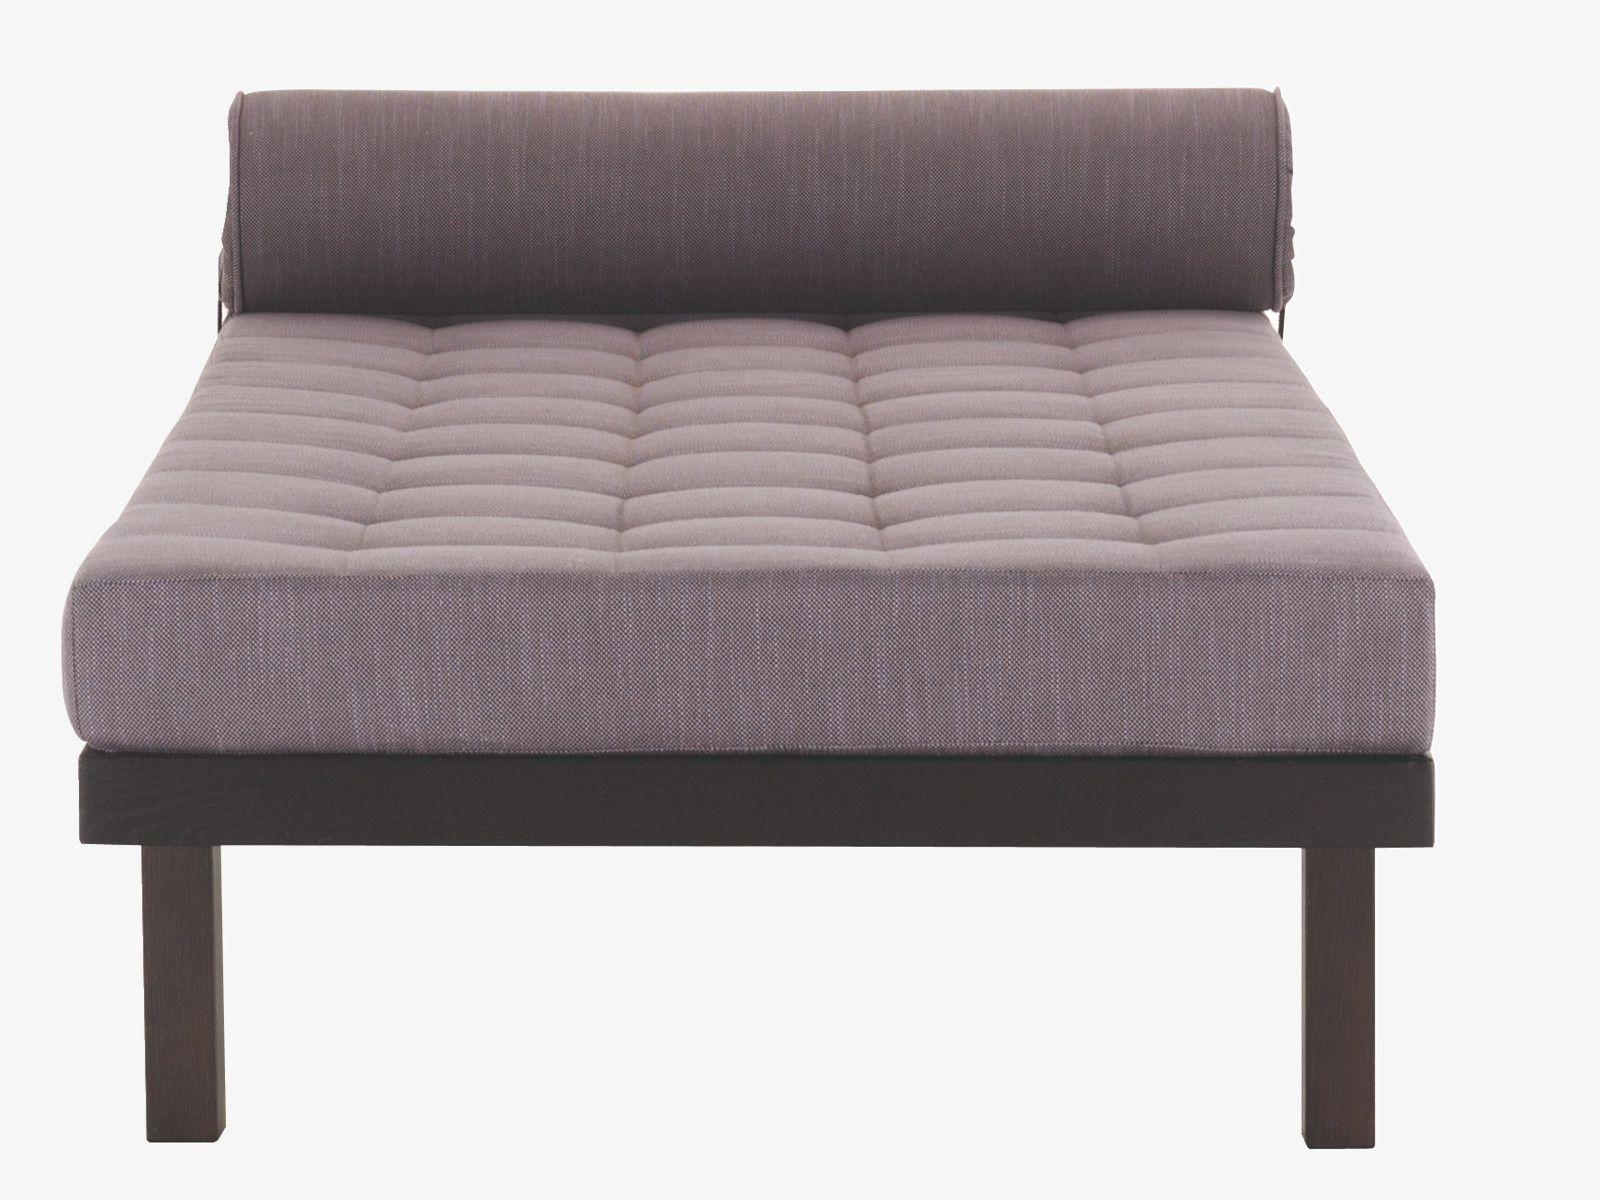 Elegant Canapé Lit Habitat